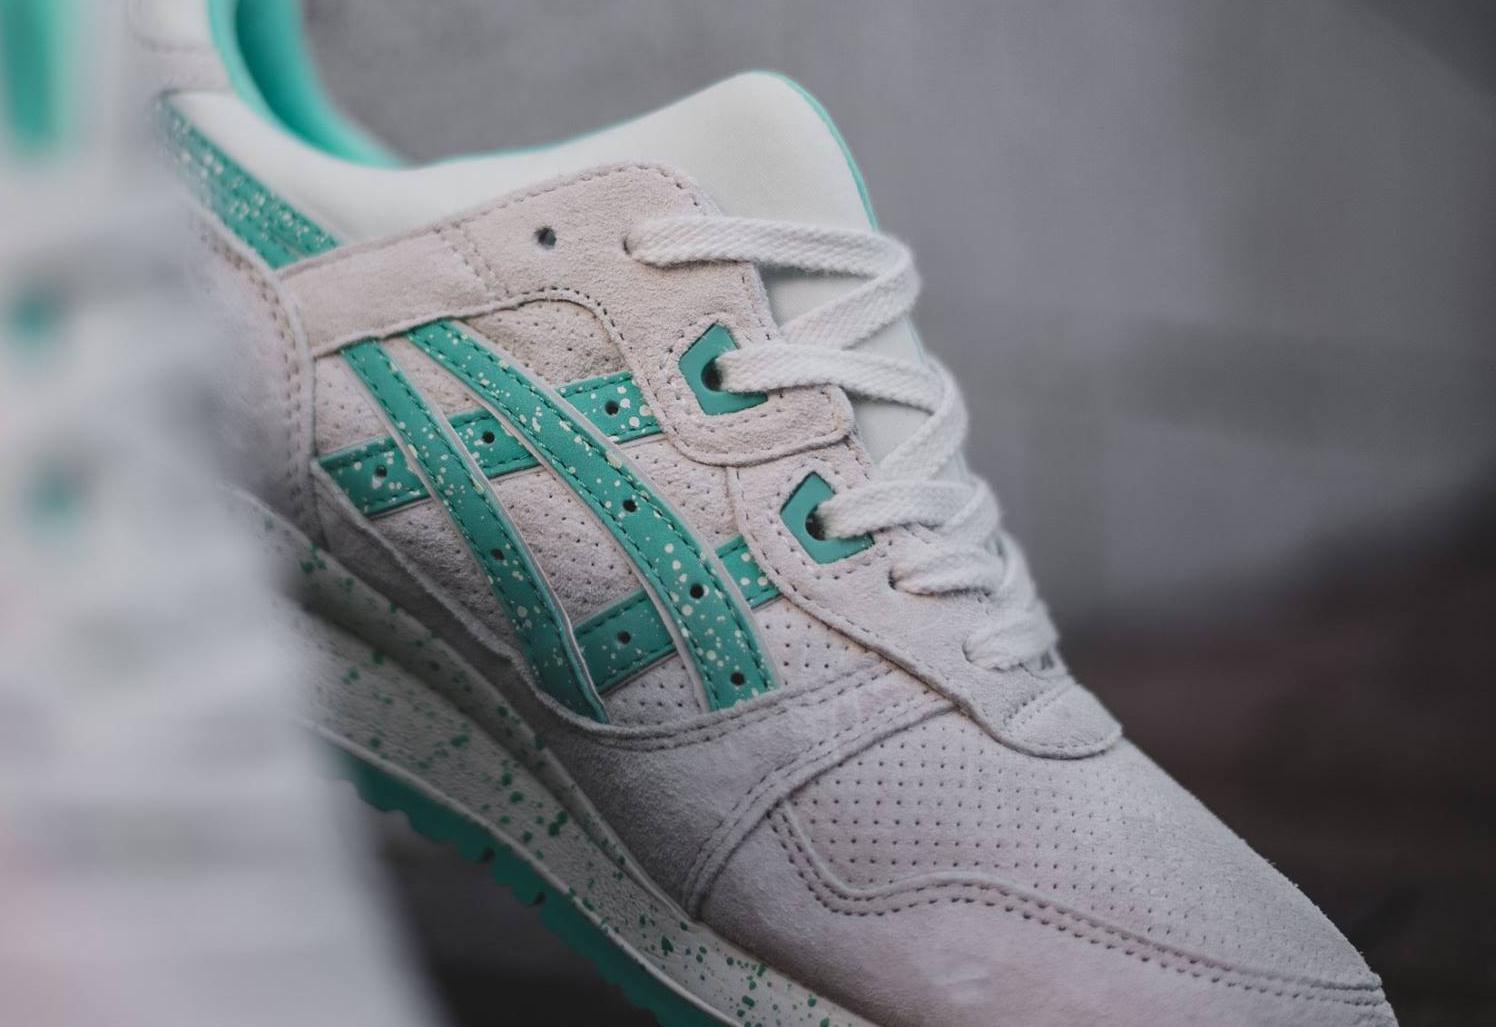 Chaussure Asics Gel Lyte III Maldives (4)